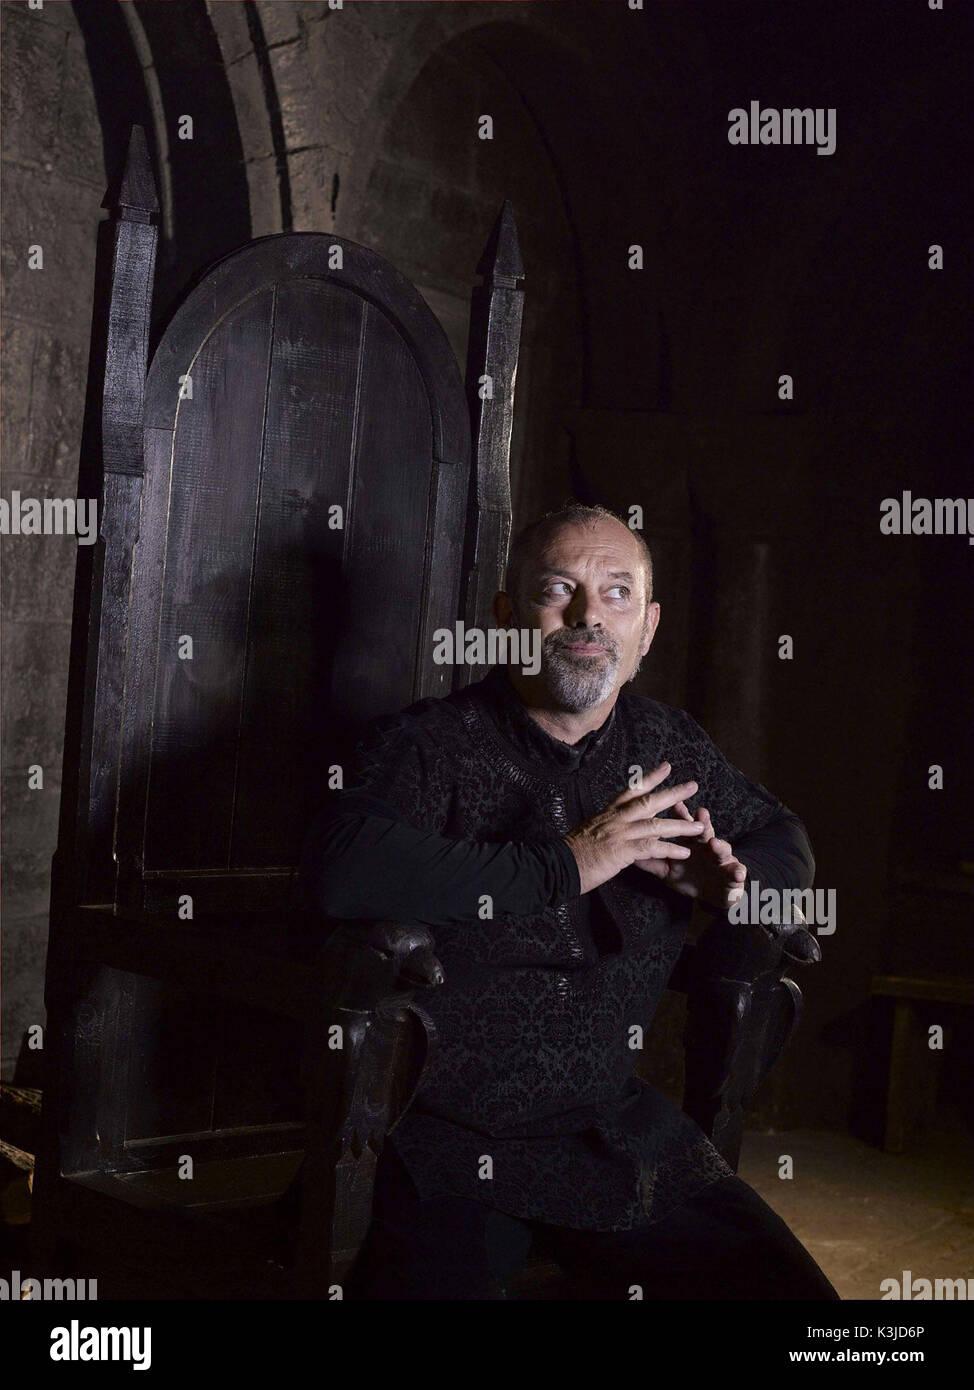 ROBIN HOOD KEITH ALLEN as the sheriff of Nottingham ROBIN HOOD     Date: 2006 - Stock Image